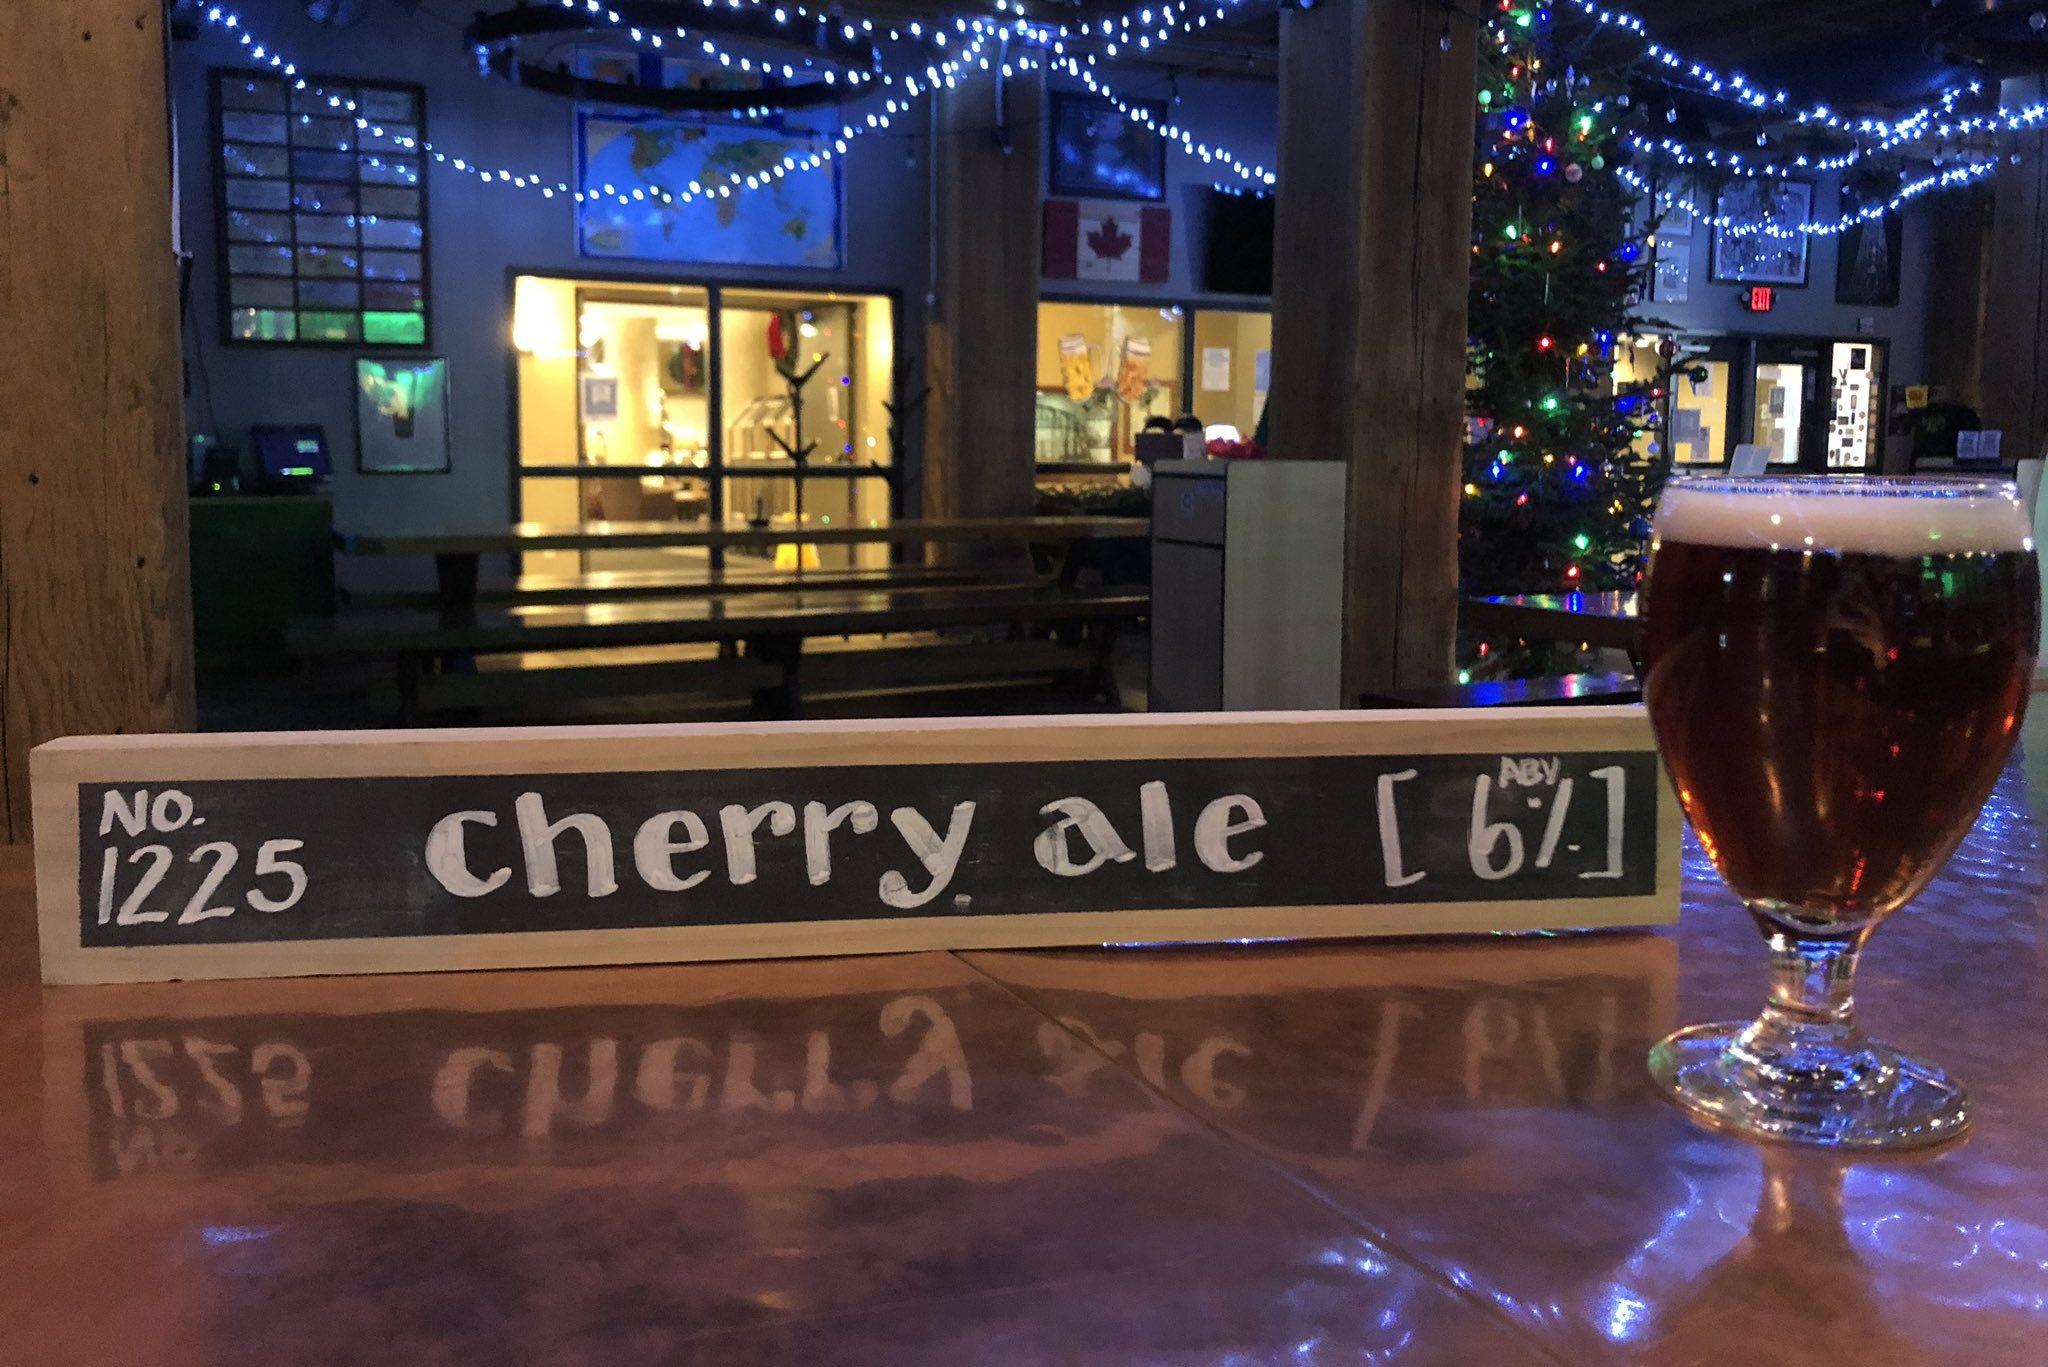 Hoops No. 1225 Cherry Ale • Photo via Hoops Brewing